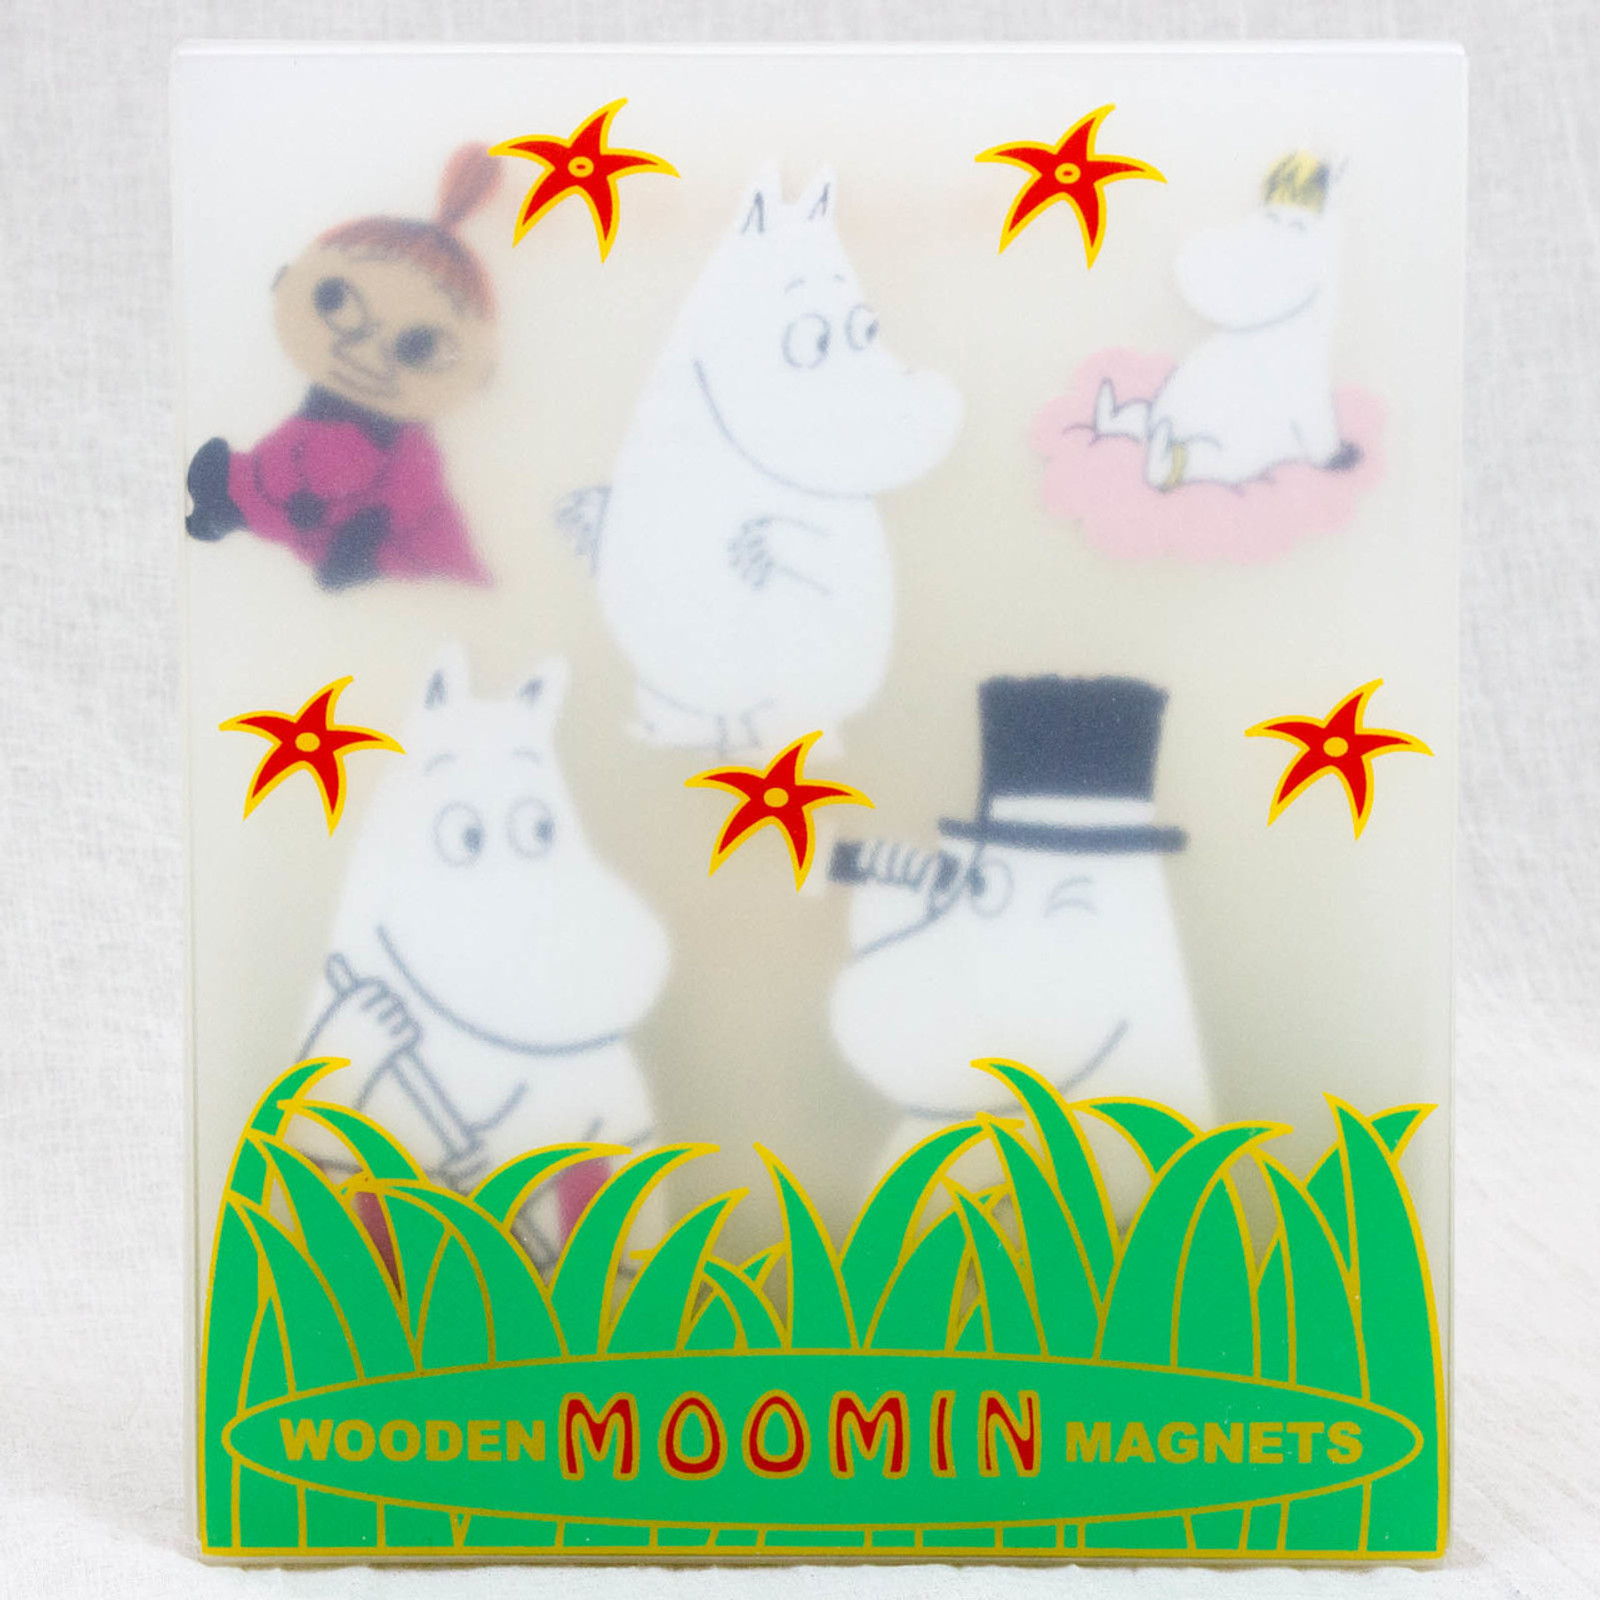 RARE!!! Moomin Wooden Magnets Set APRILMAI FINLAND